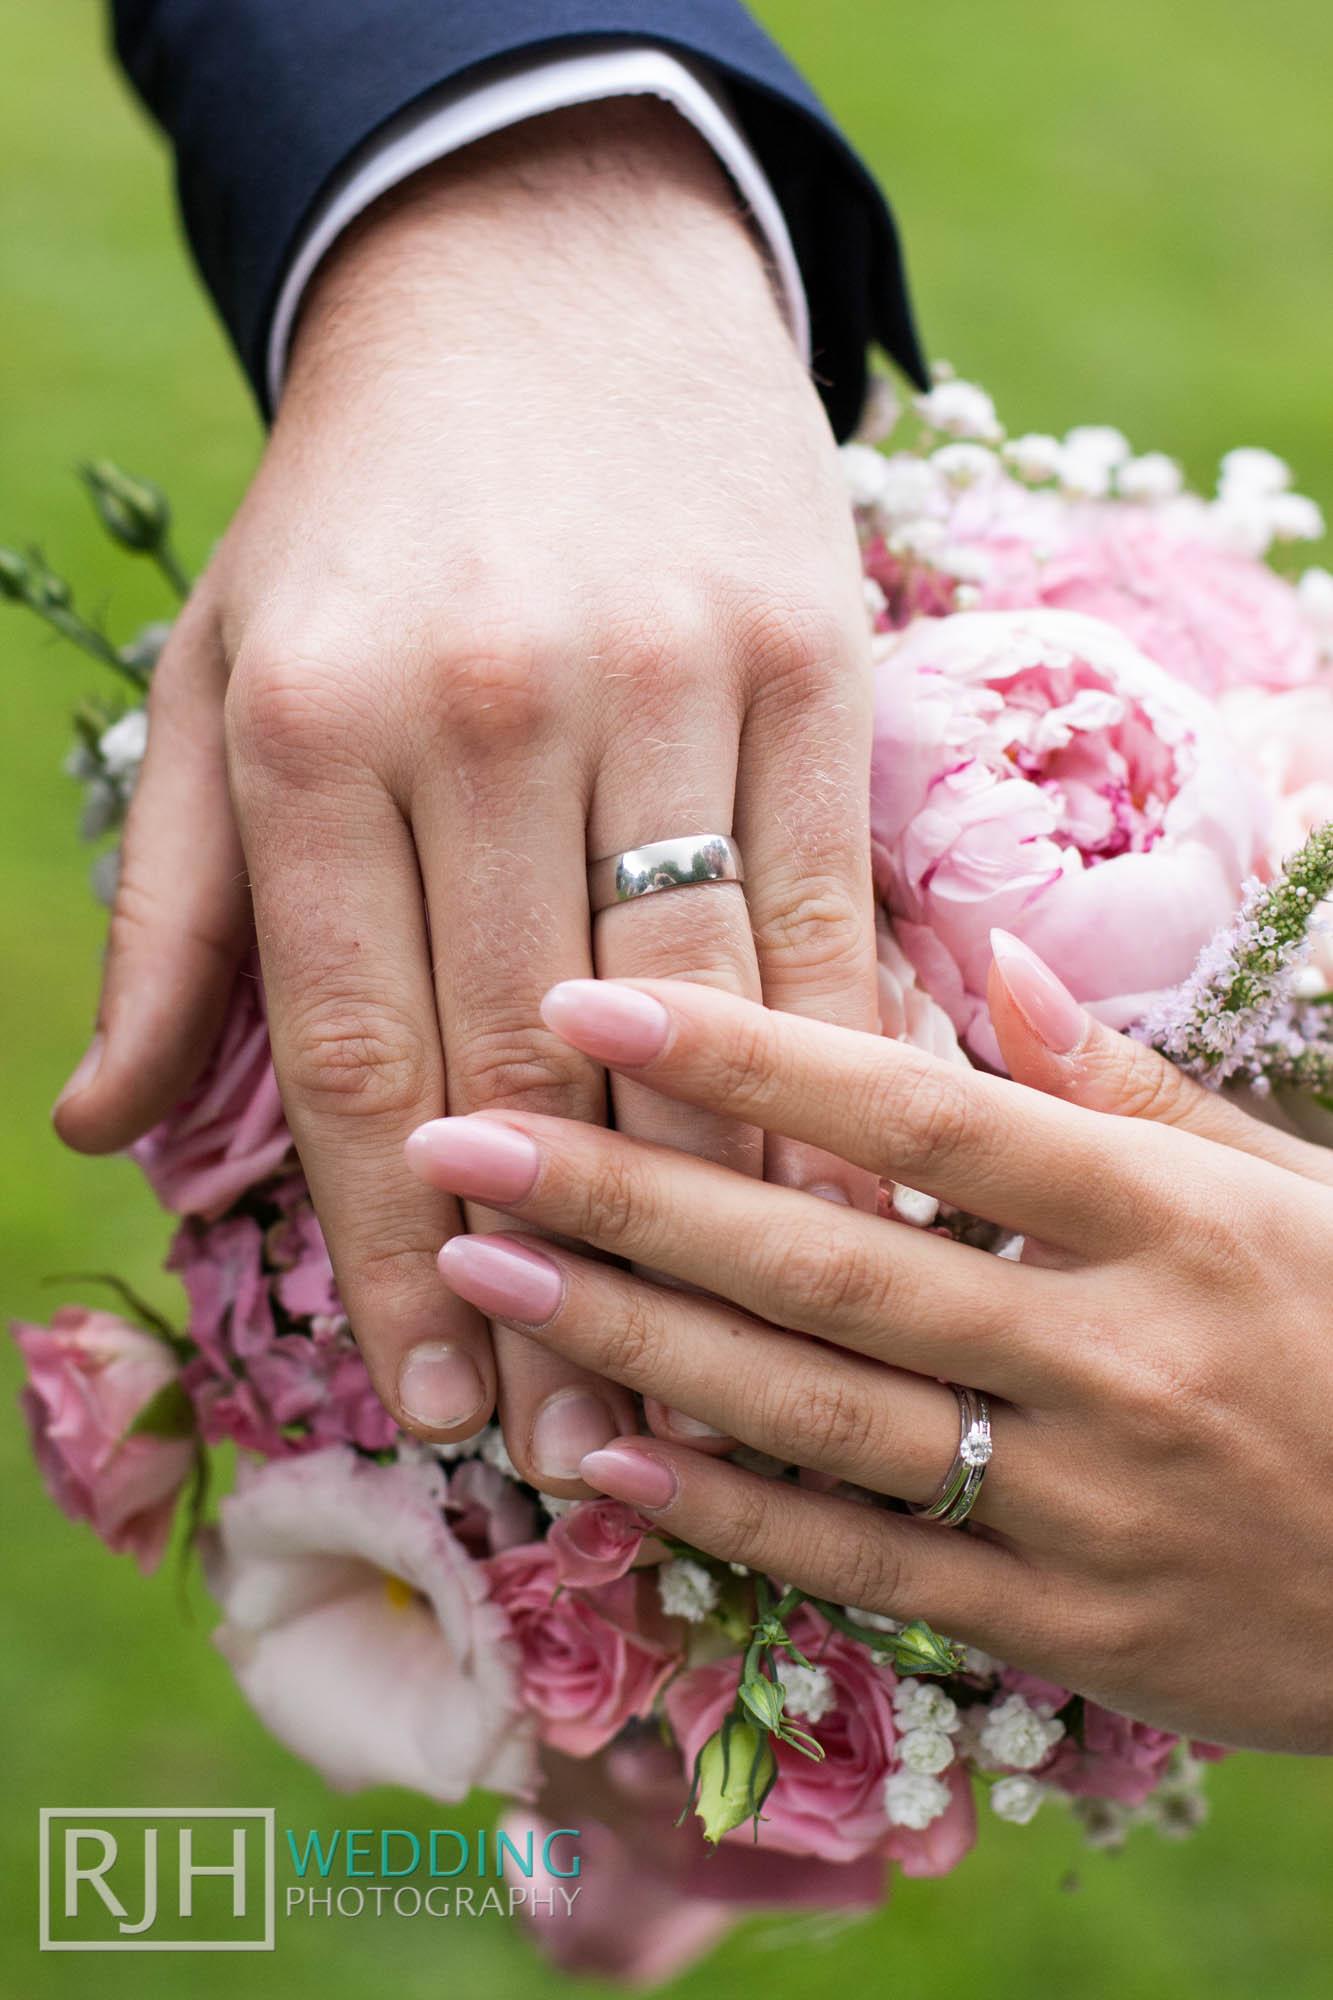 RJH Wedding Photography_Tankersley Manor Wedding_27.jpg